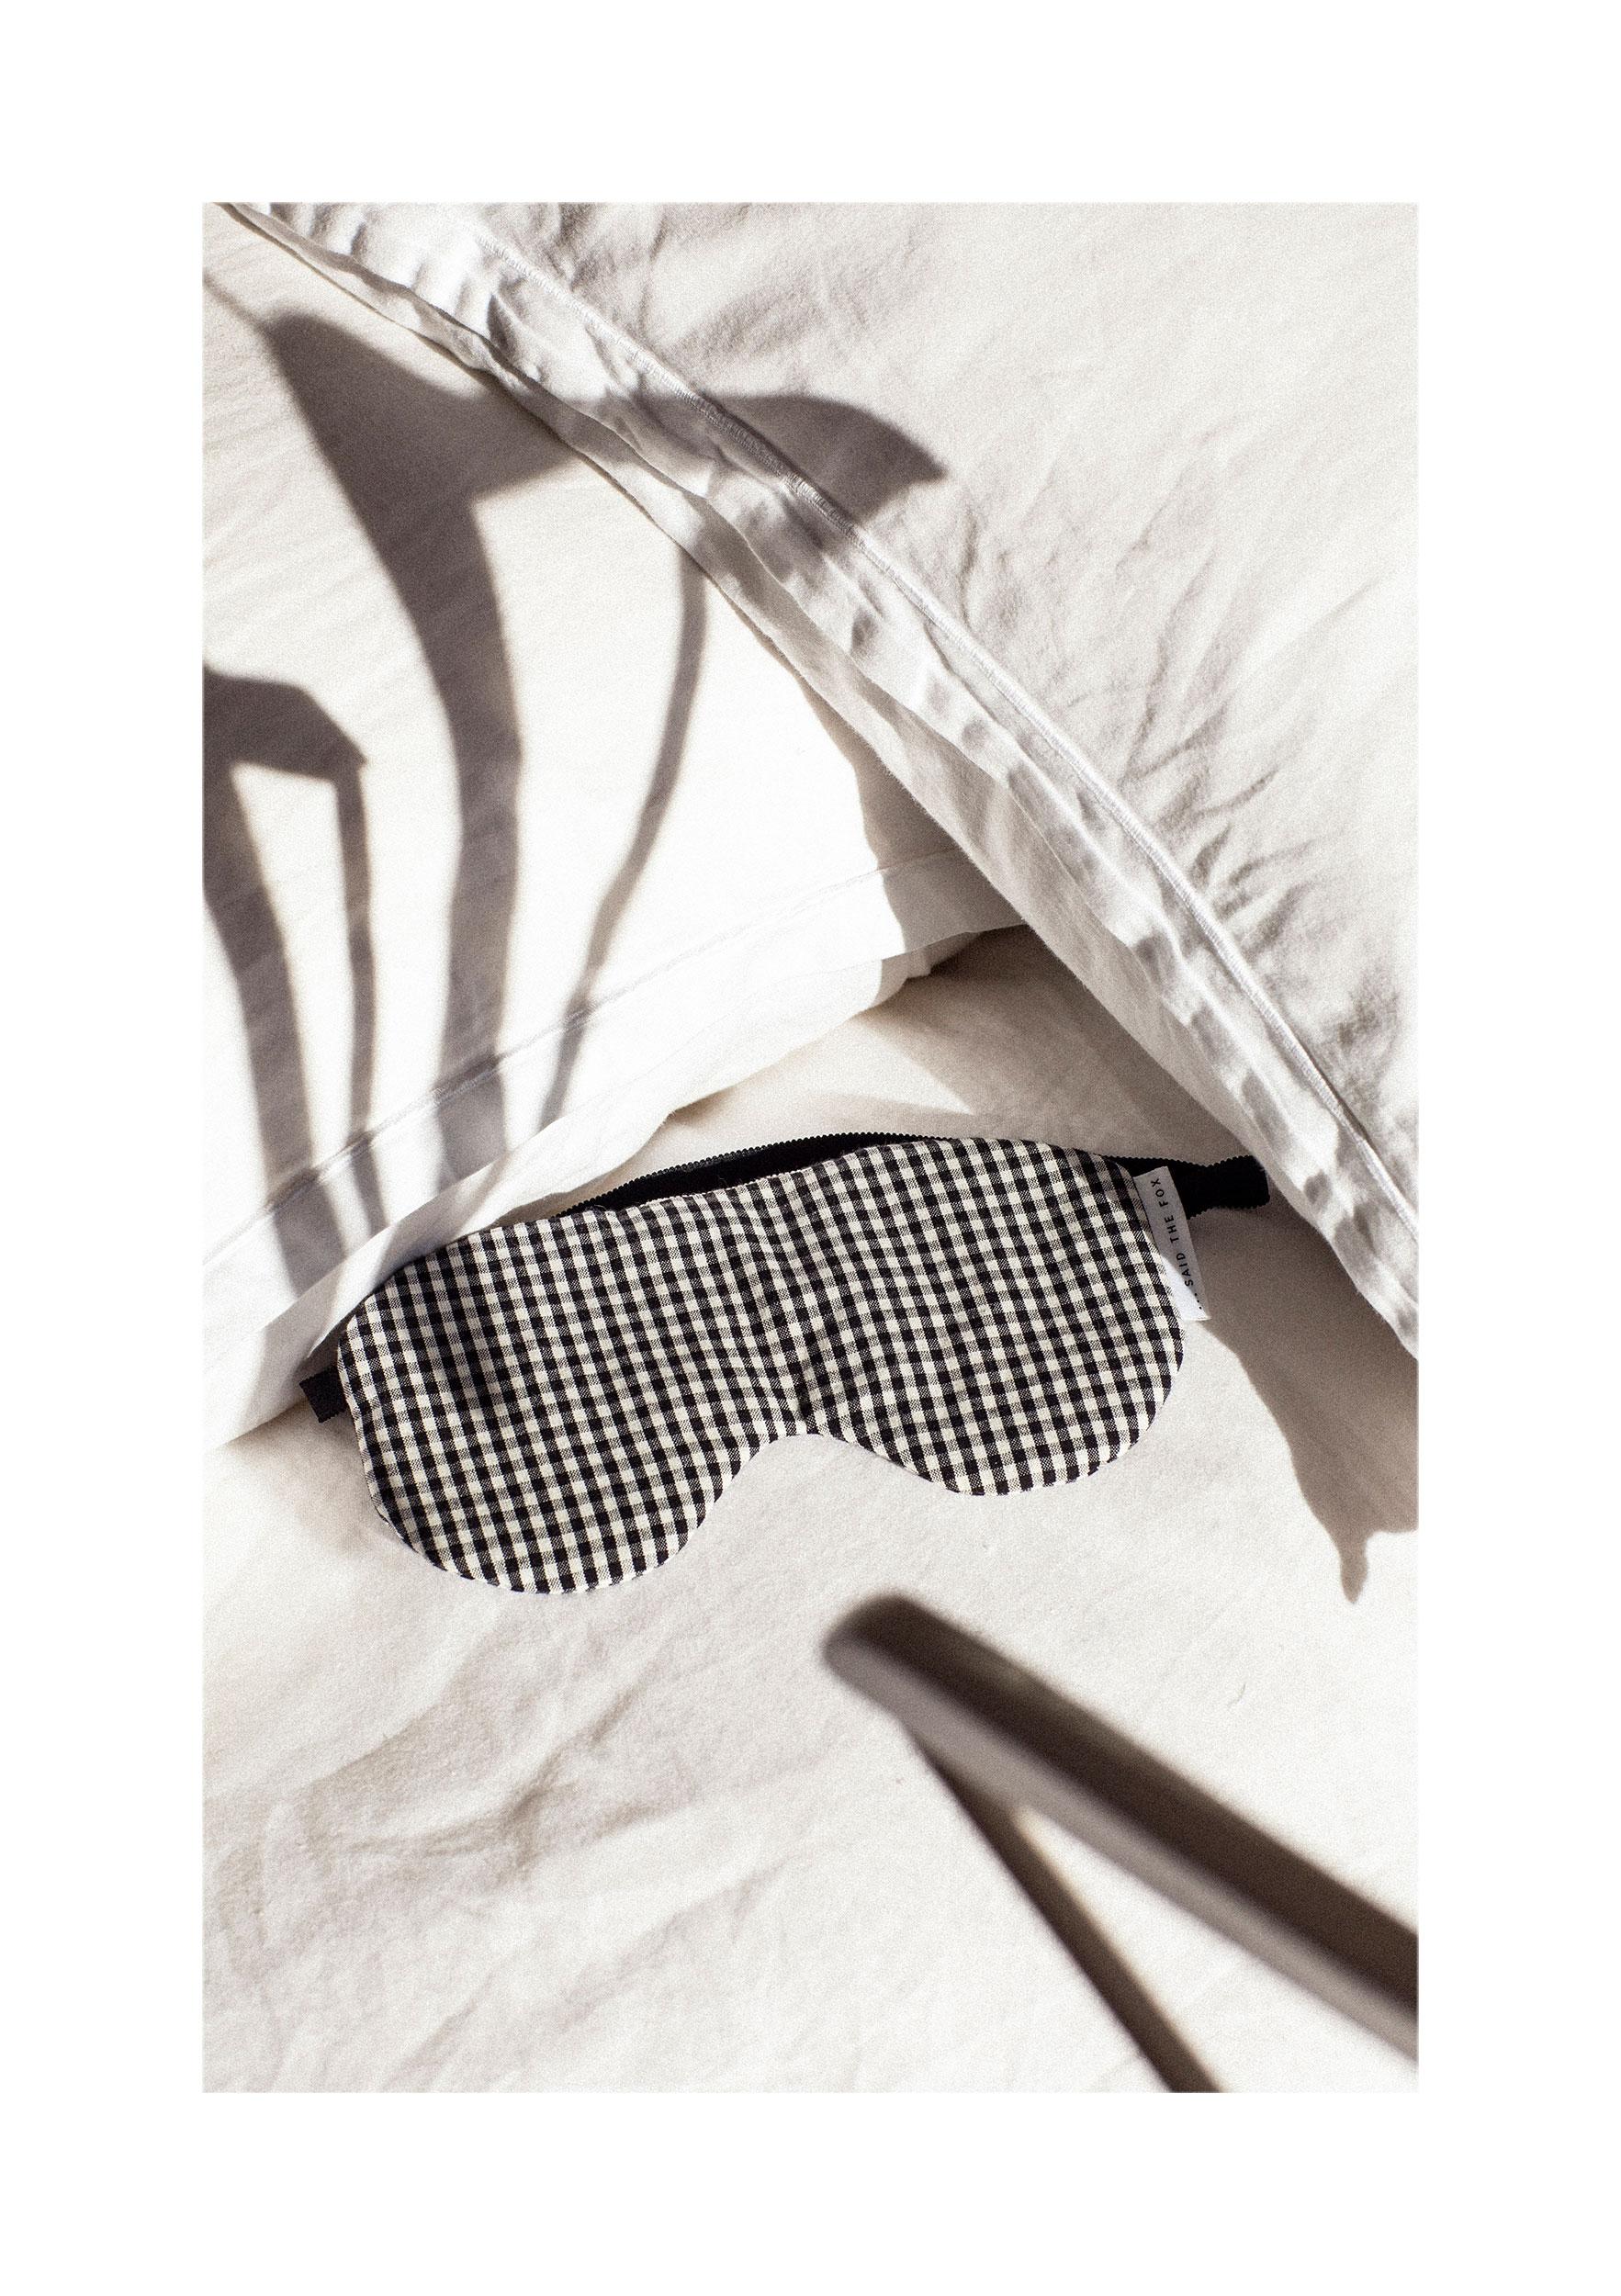 SAIDTHEFOX-lookbook-organiccotton-GinghamCheck-sleepmask